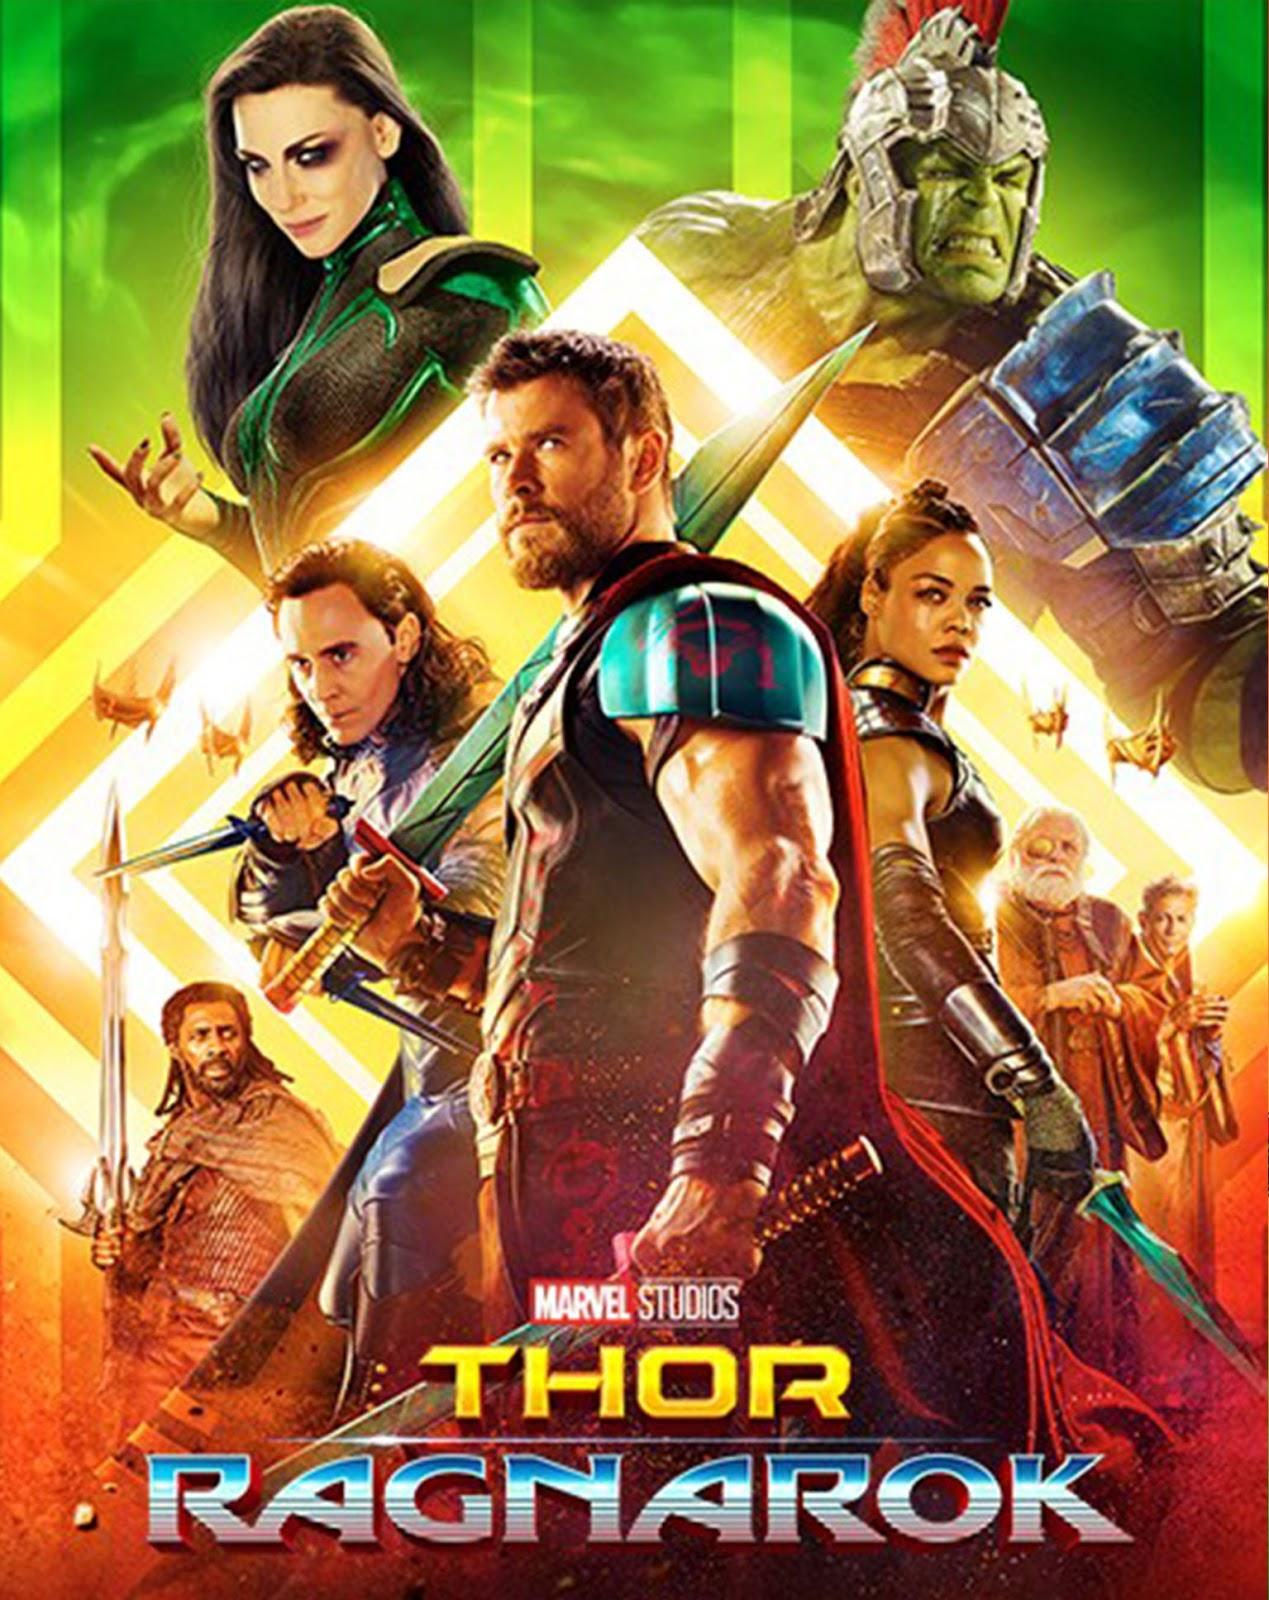 Thor: Ragnarok [2017] [DVD9] [PAL] [Castellano]